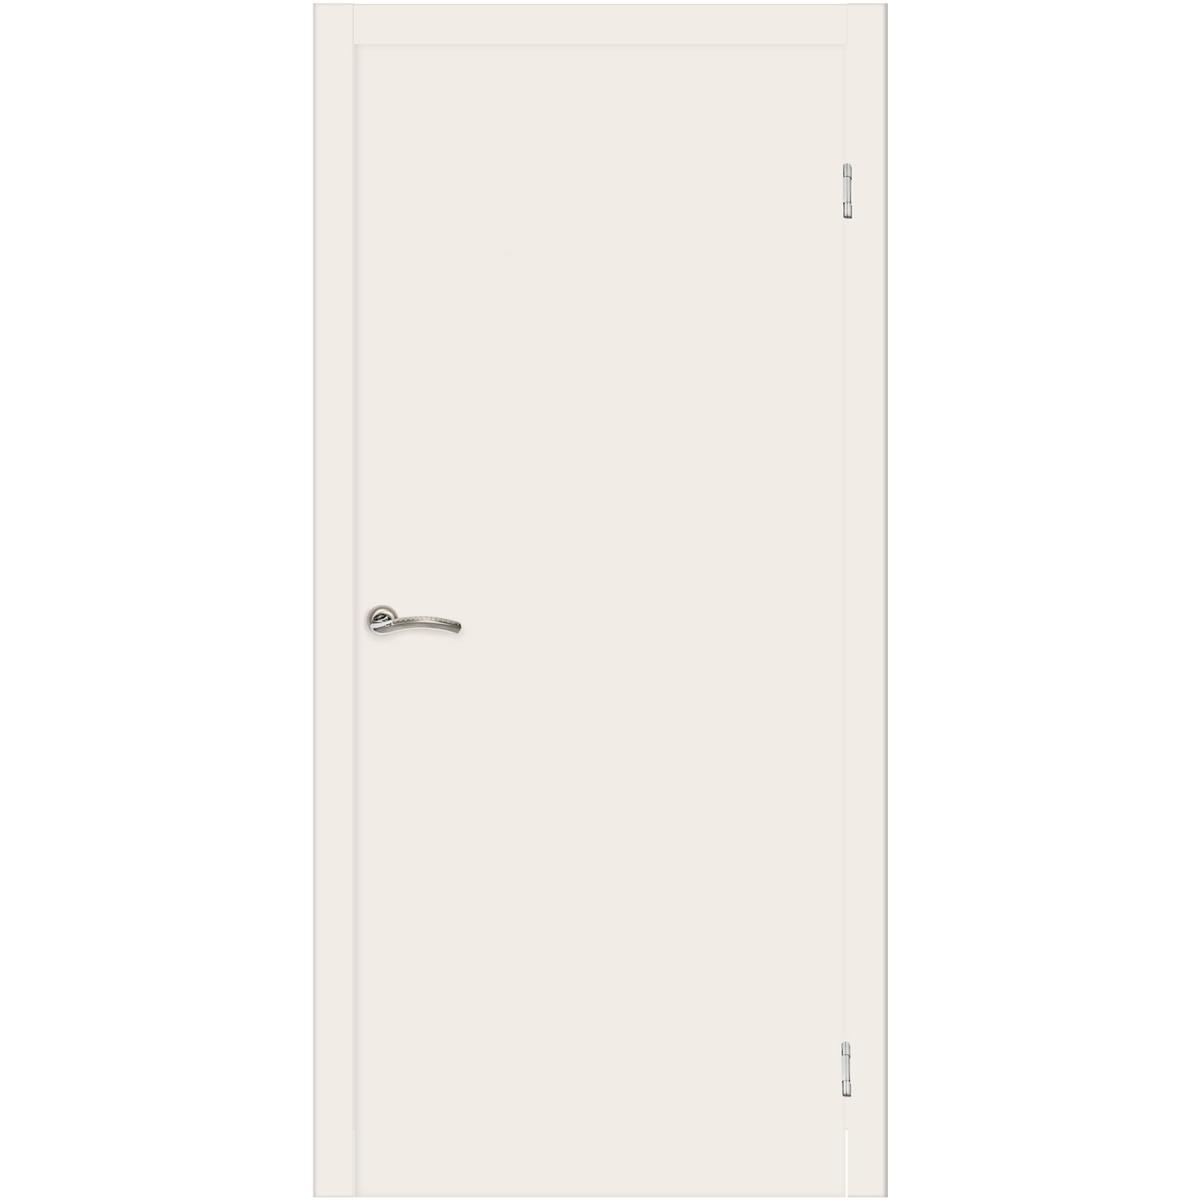 Дверь межкомнатная глухая 80x200 см ламинация цвет белый